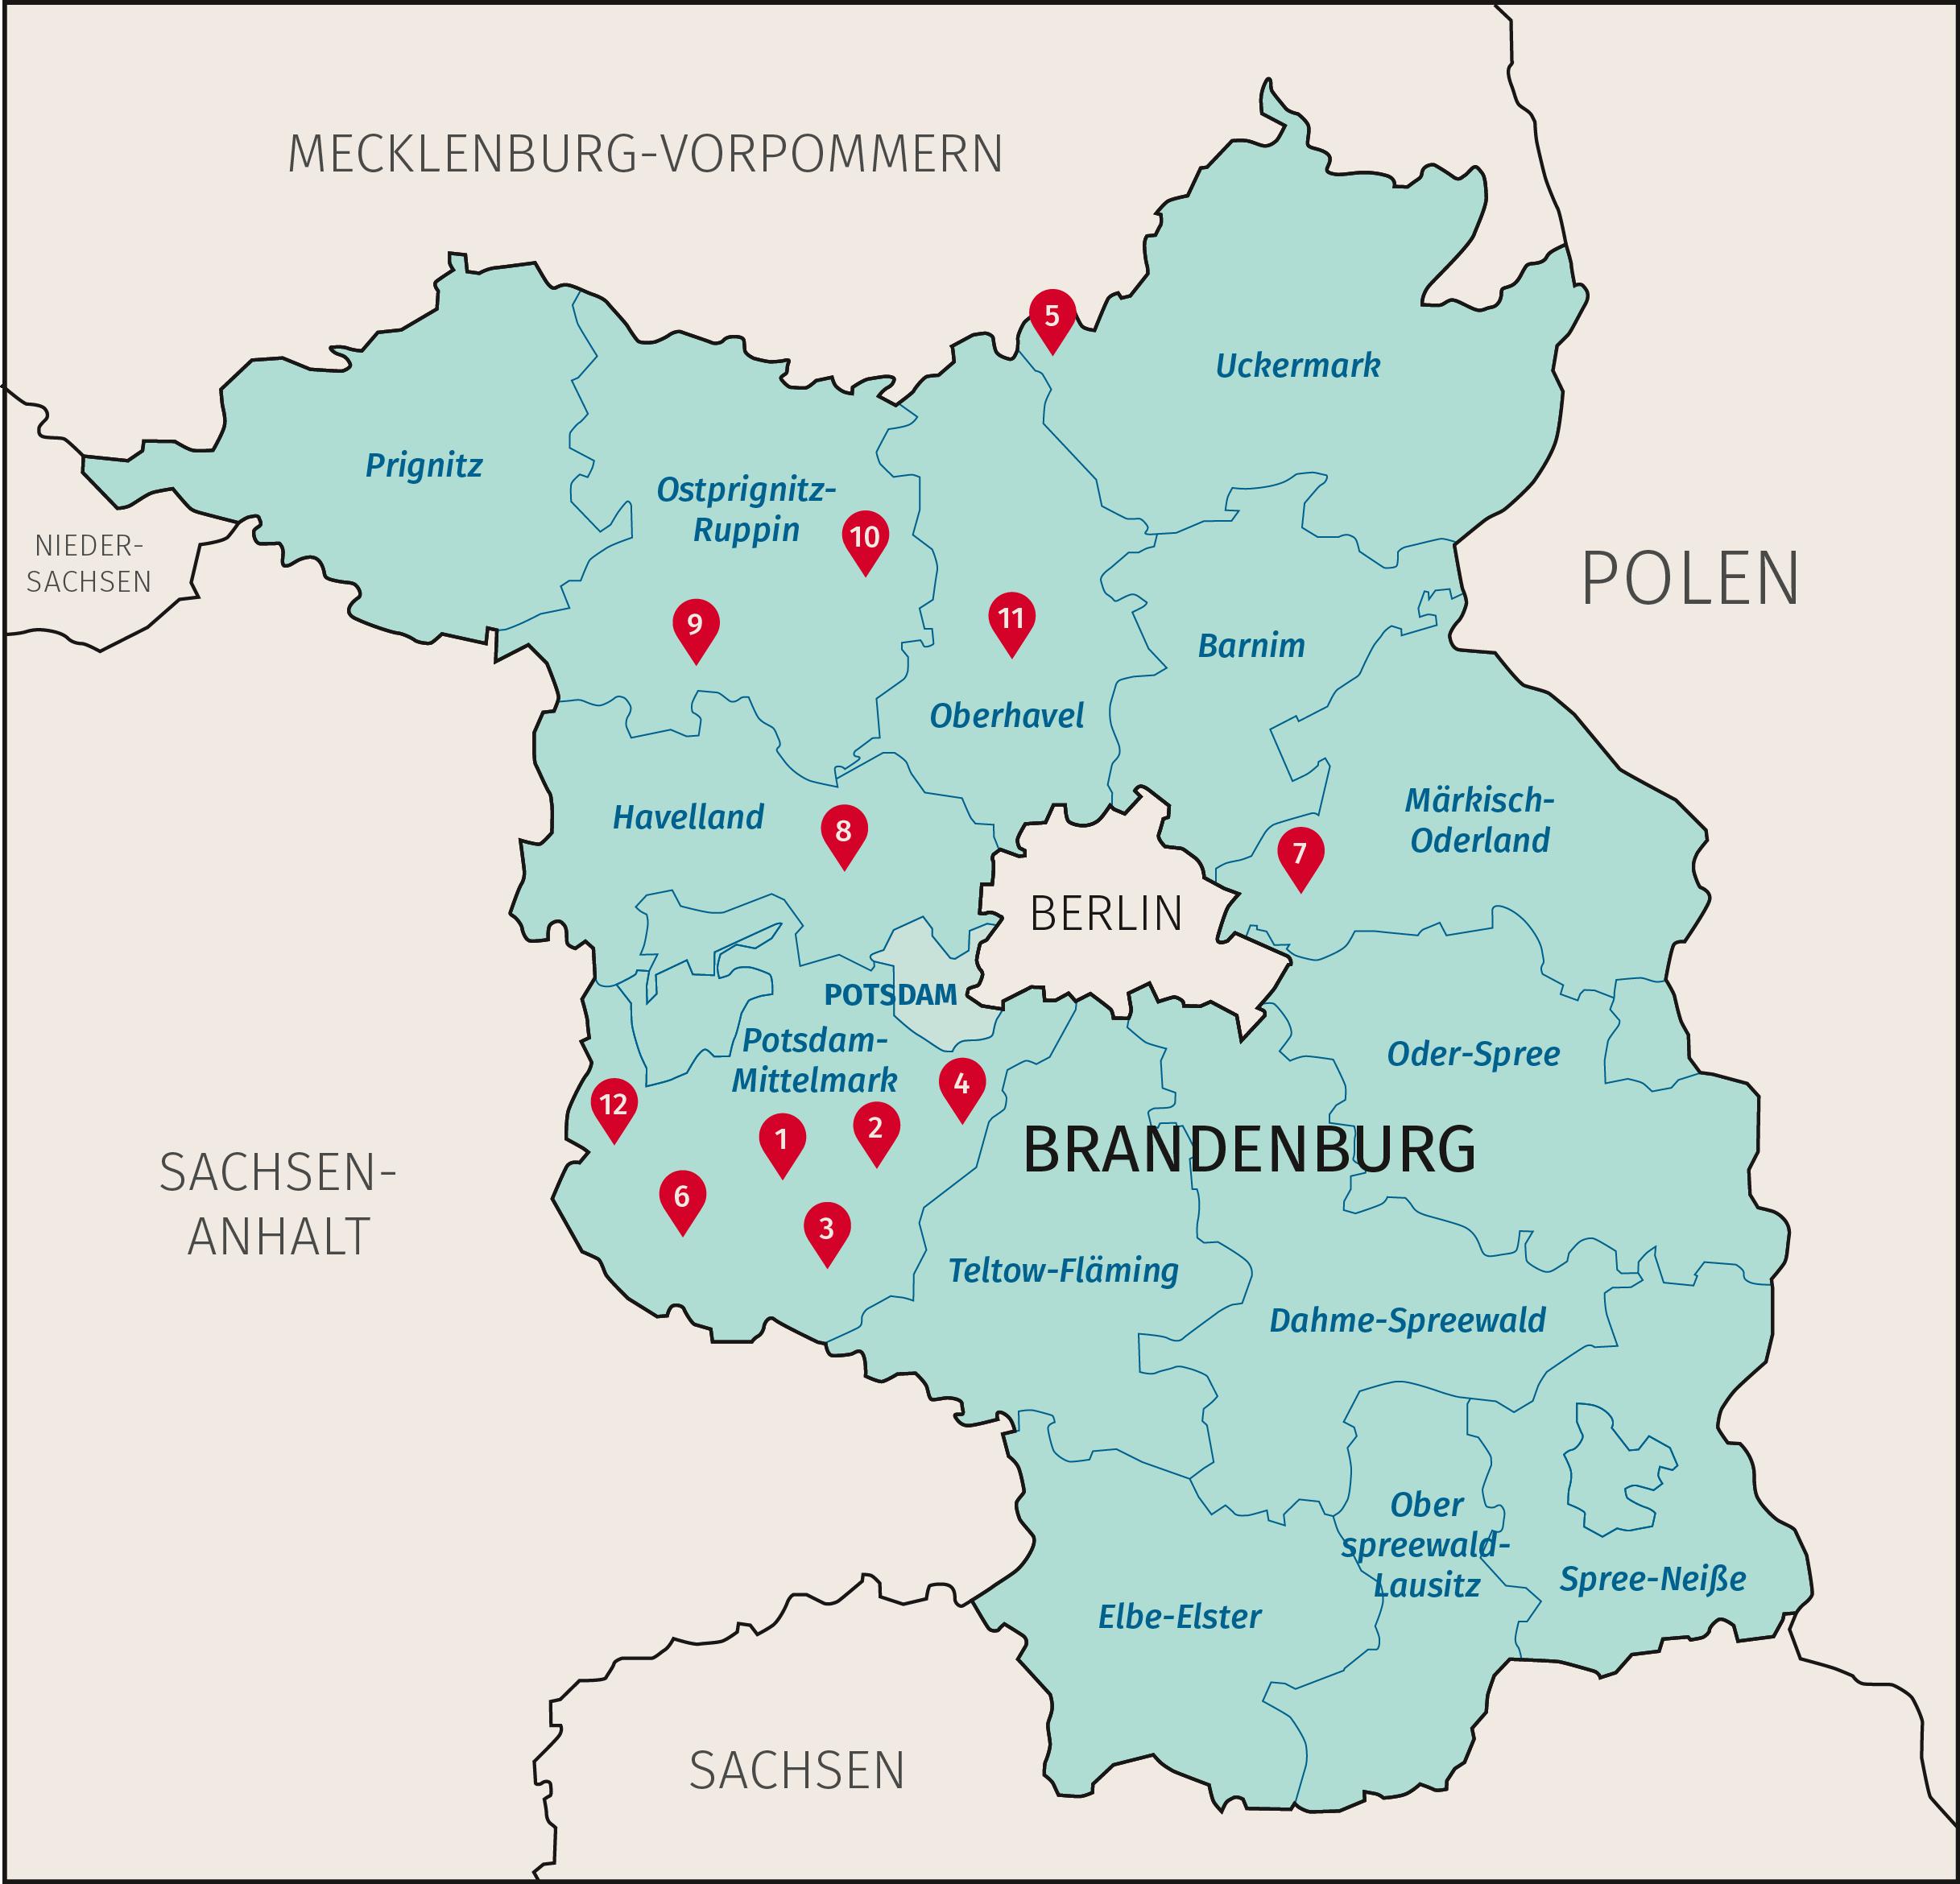 Karte Land Brandenburg